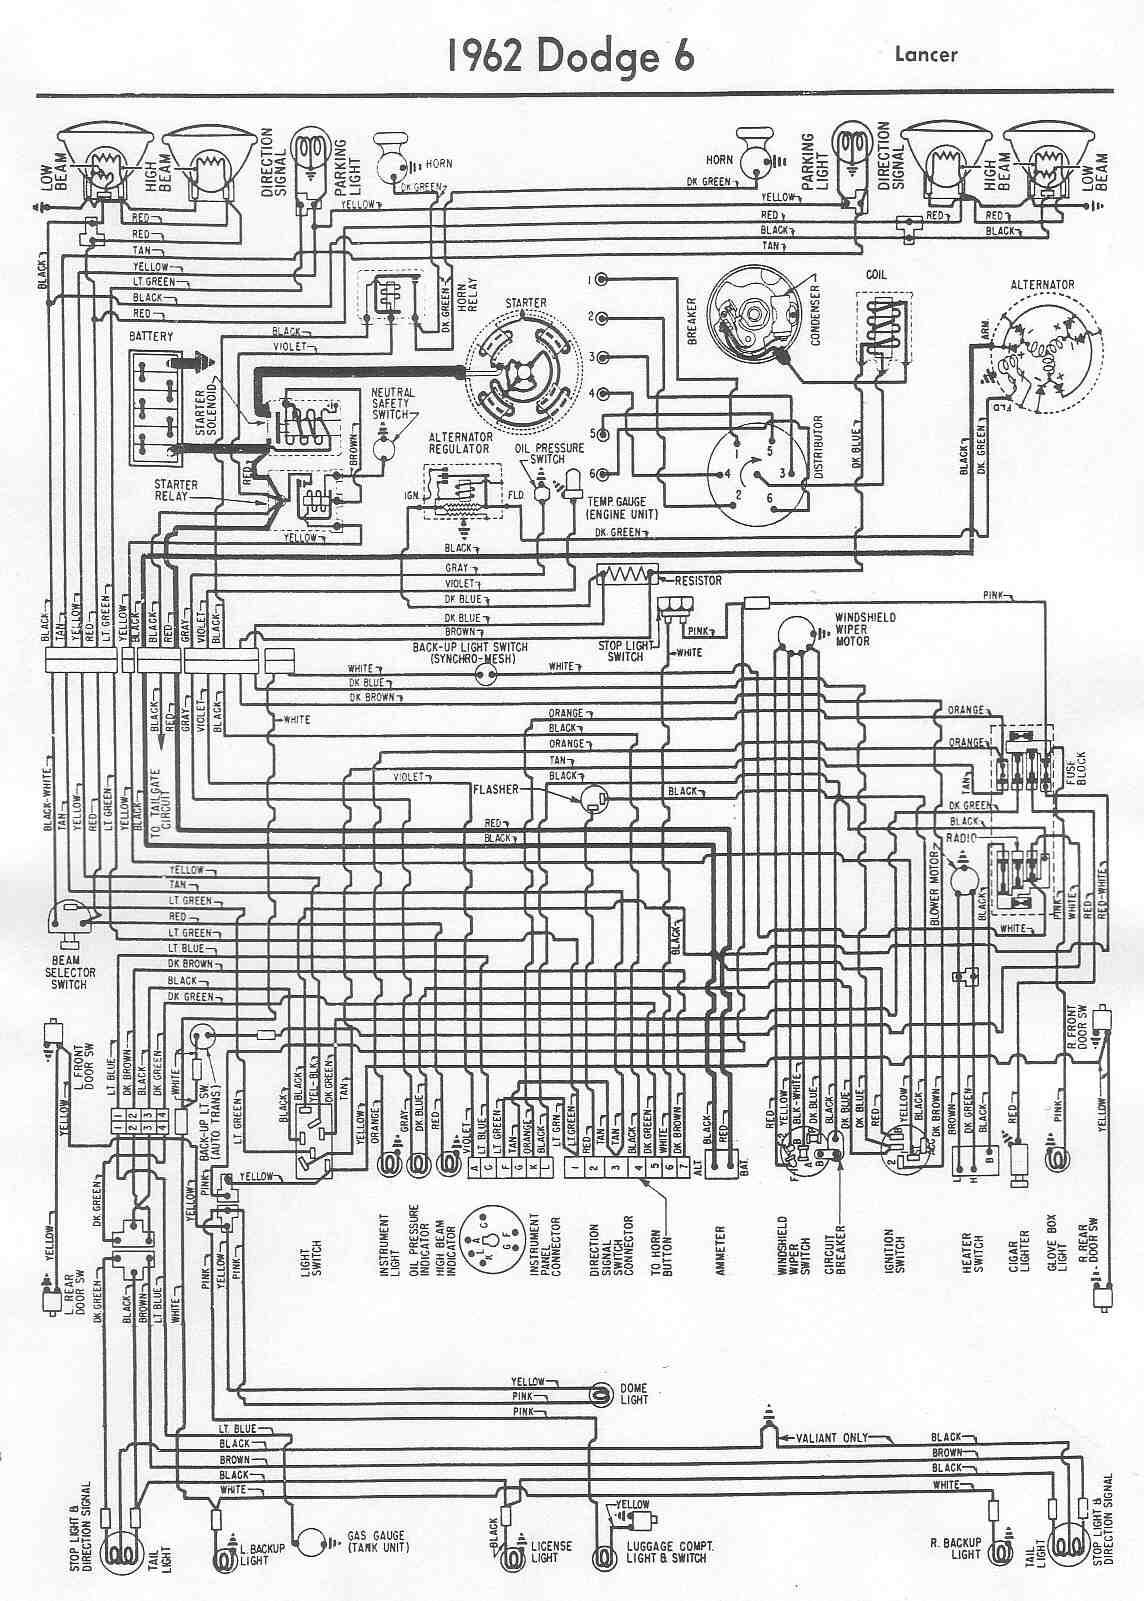 hight resolution of wiring diagram 1997 mitsubishi lancer 6 17 stromoeko de u2022wiring diagram 1997 mitsubishi lancer manual